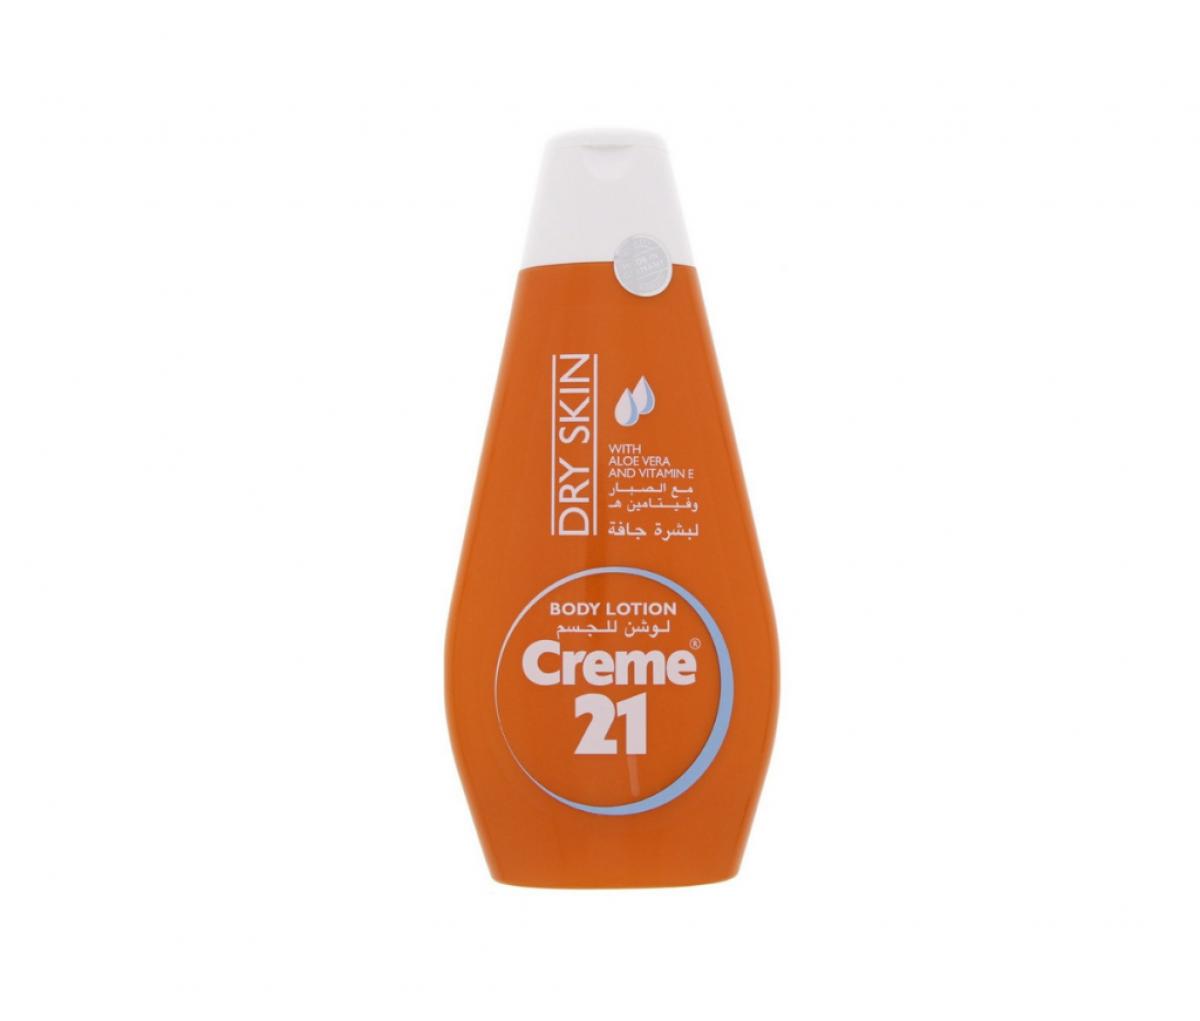 Crème 21 Lotion 400ml Dry Skin